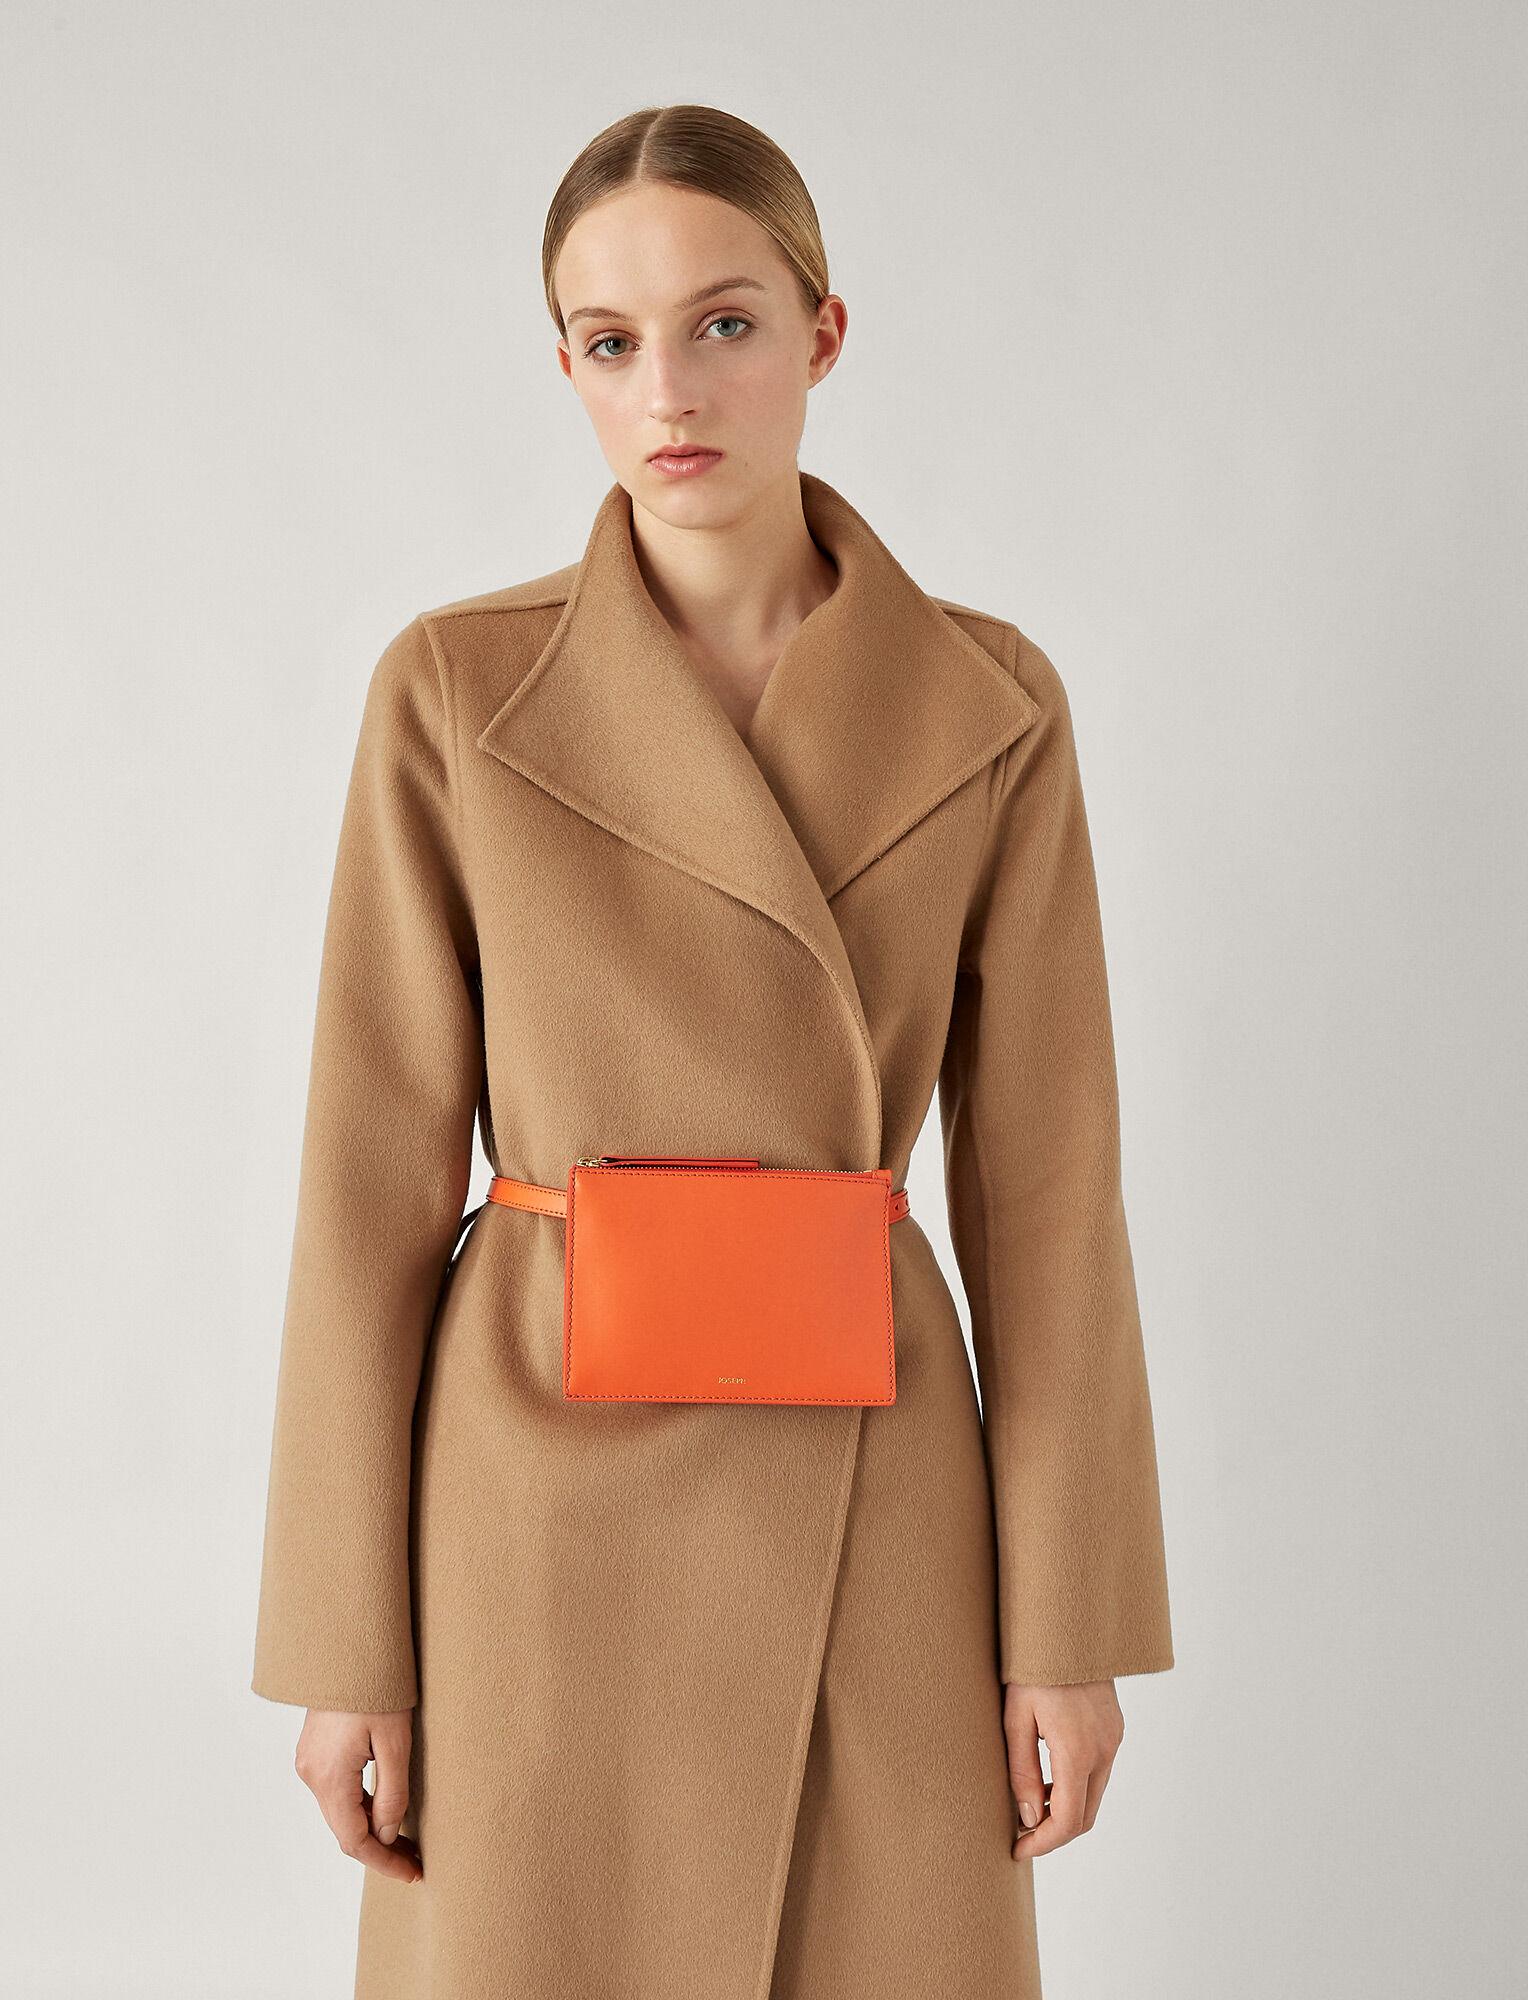 Joseph, Montmartre Leather Bag, in CARNELIAN